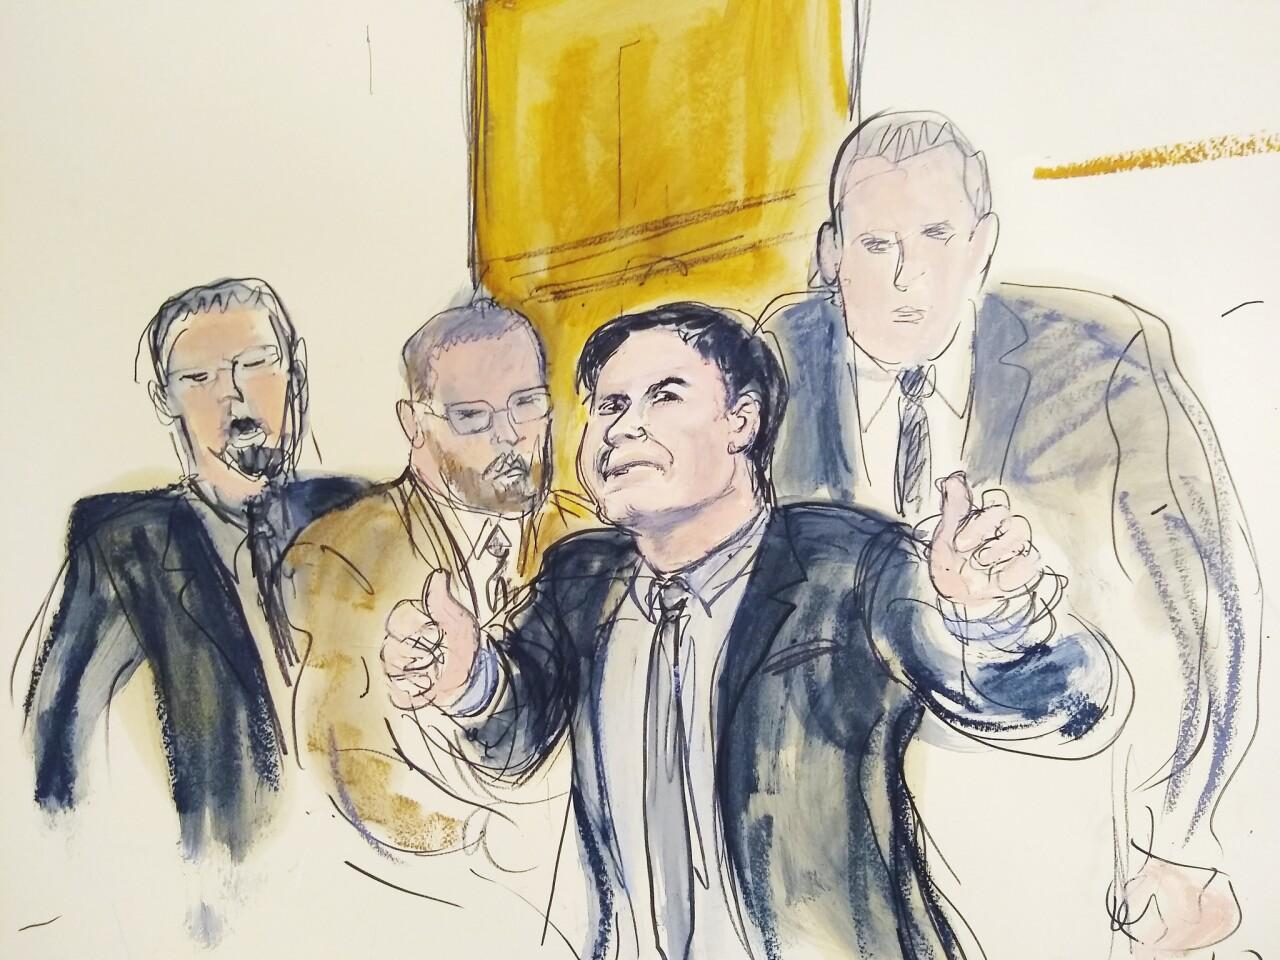 'El Chapo' verdict